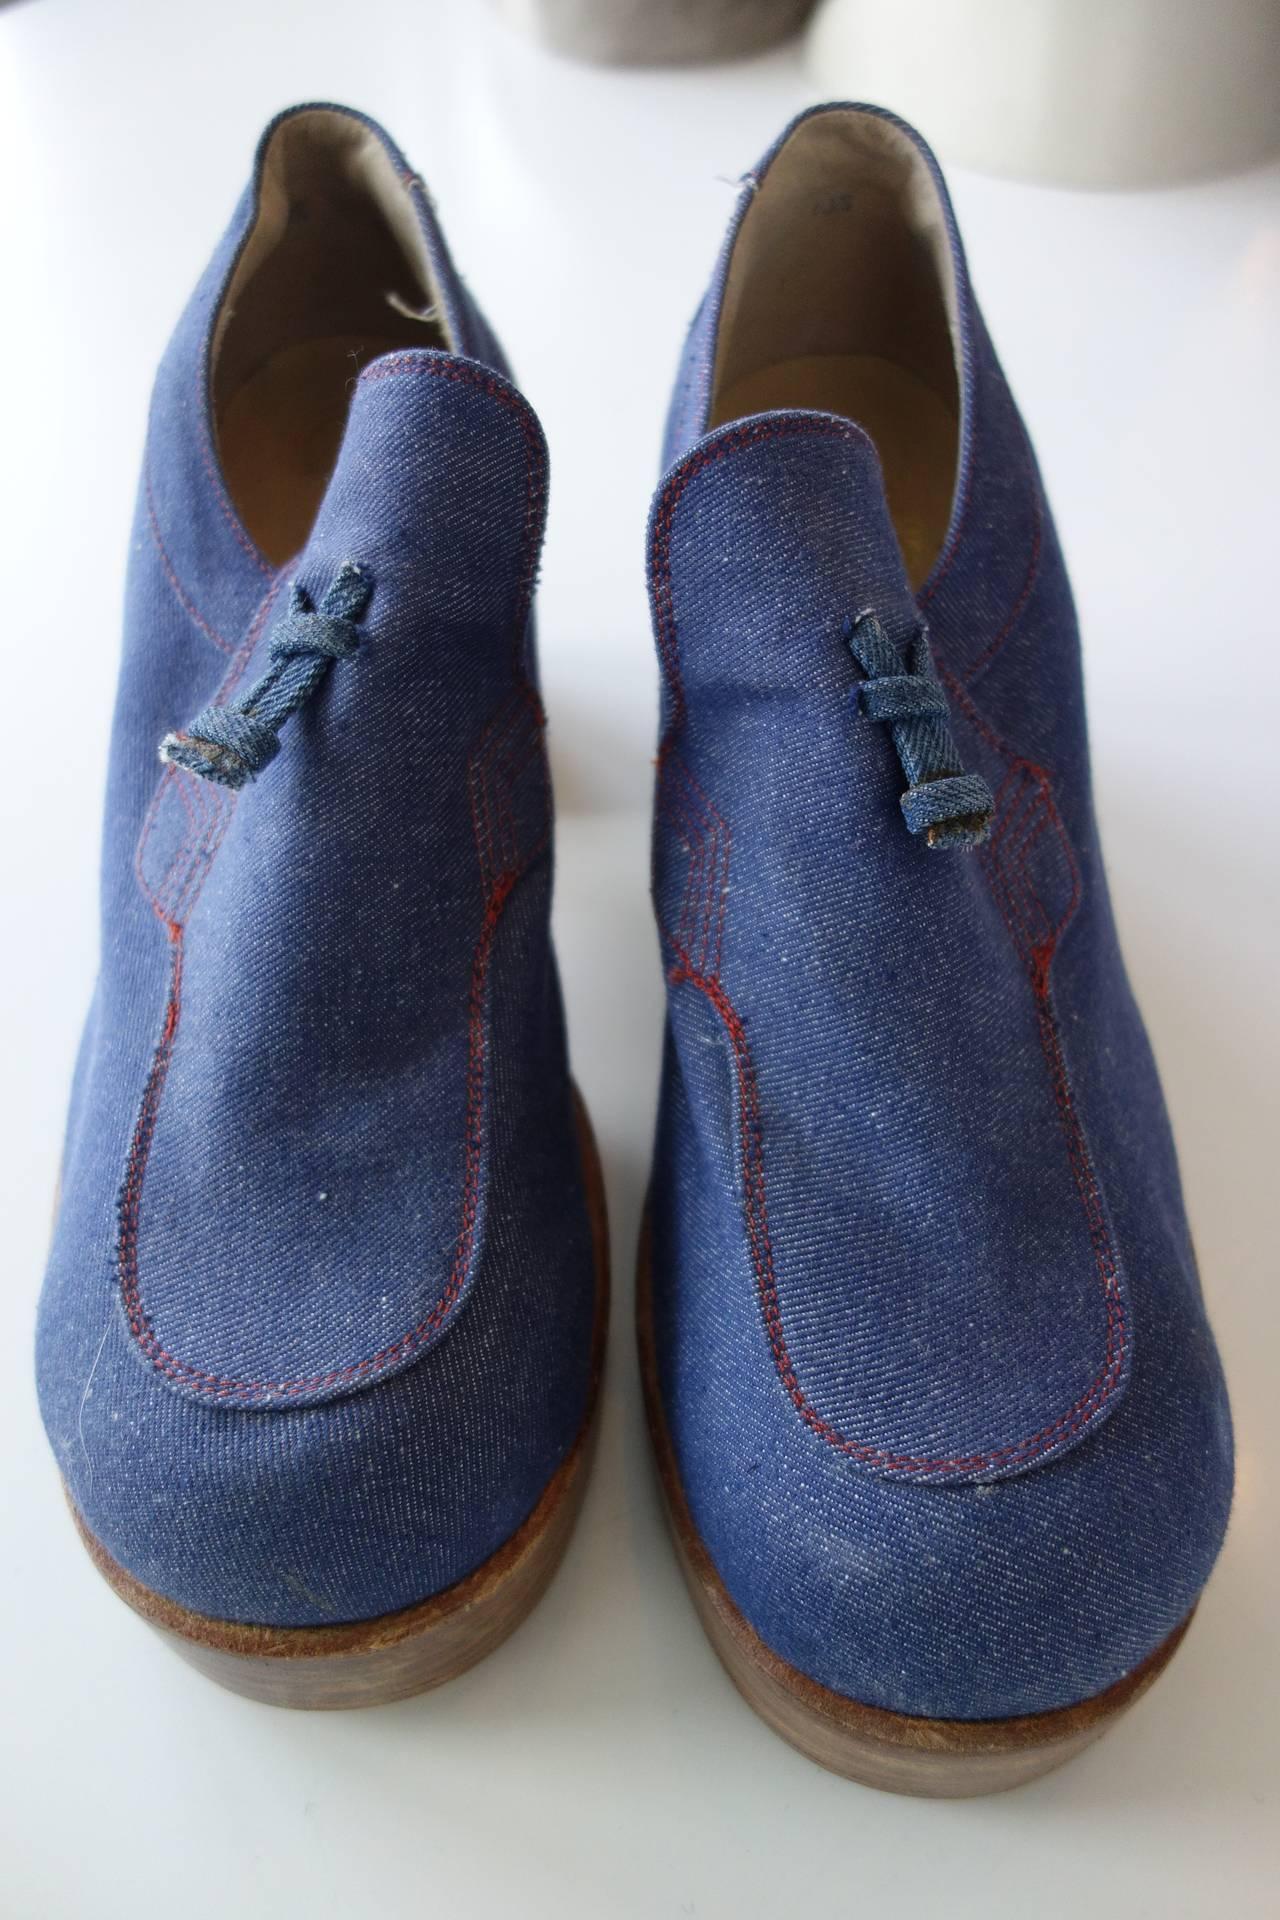 1970's Fantasia Men's Platform Shoes For Sale 1